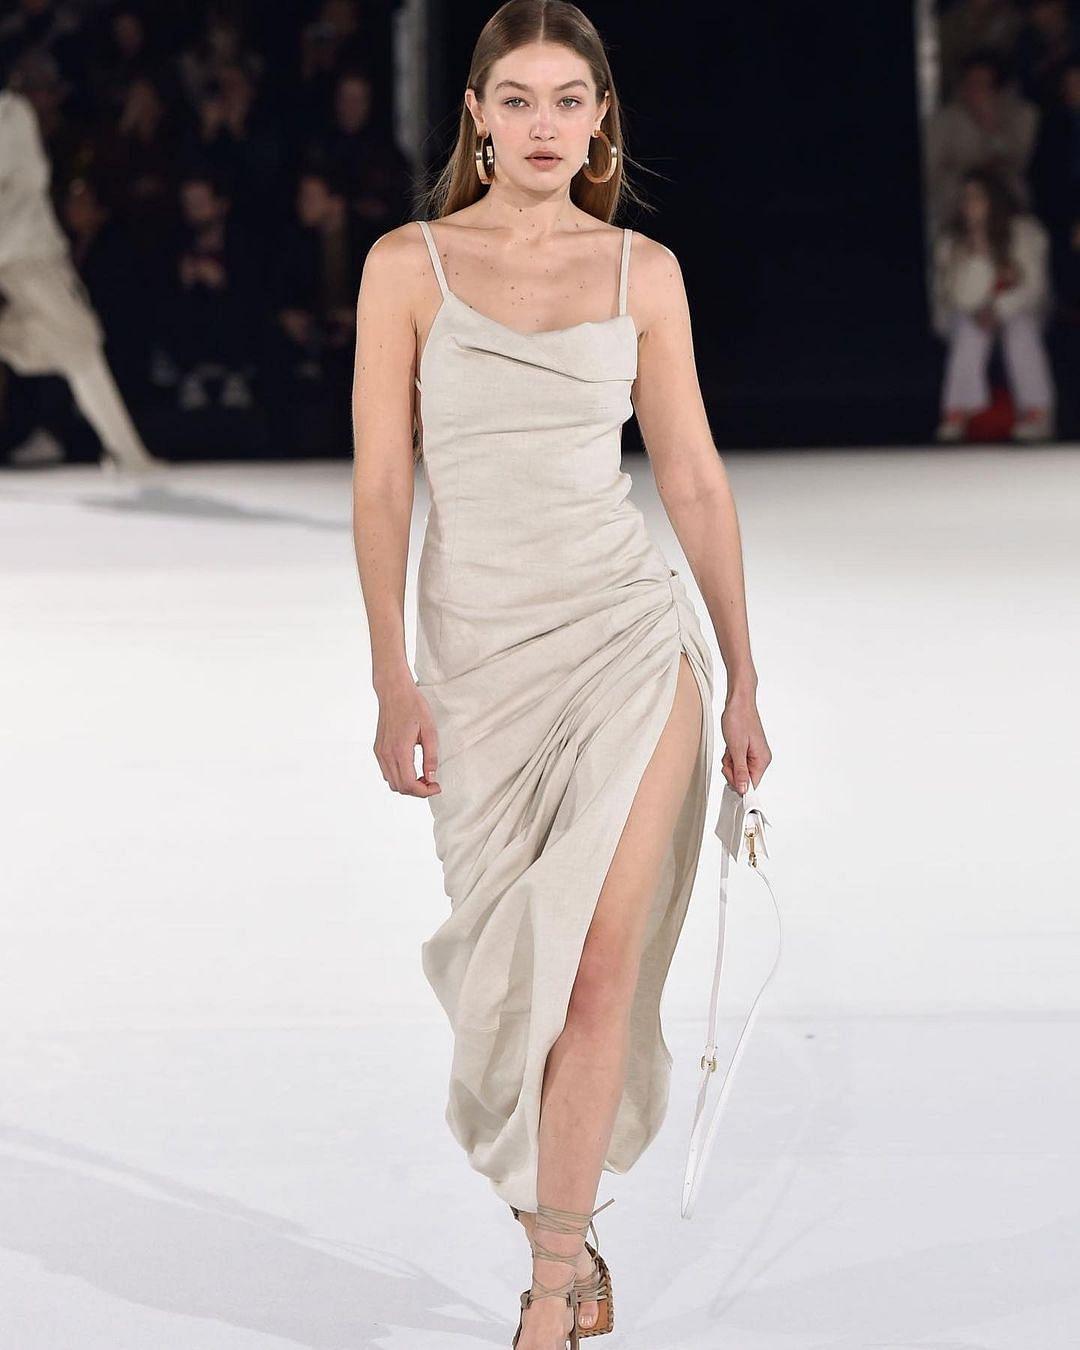 In Pics: Priyanka Chopra copies Gigi Hadid's iconic runway dress worth nearly Rs 60,000